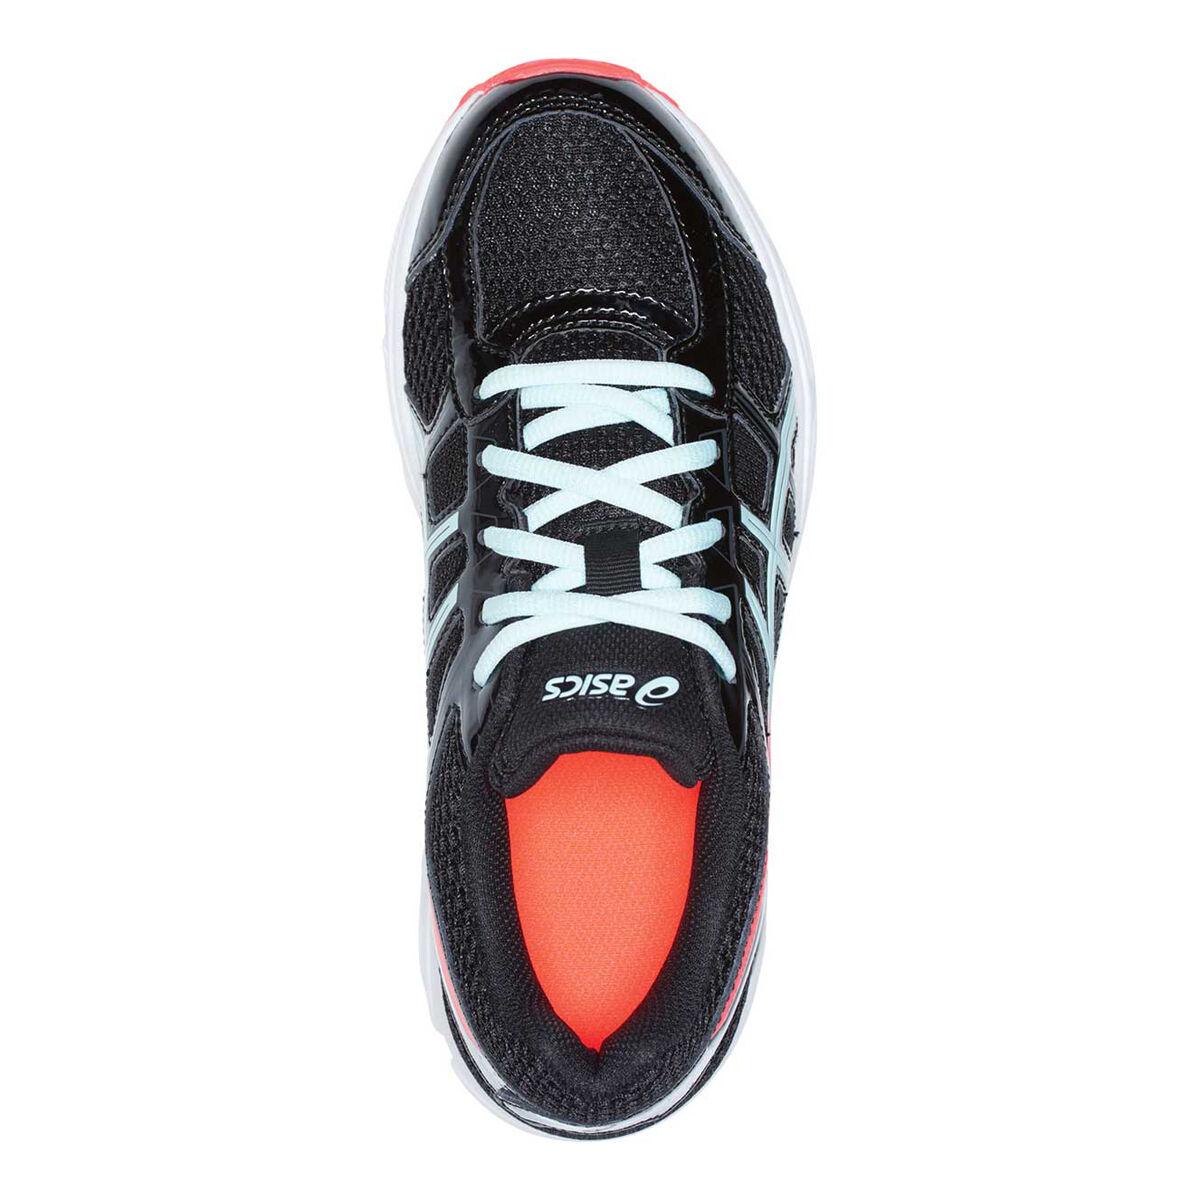 Chaussures de course 4 6 Asics Asics Gel Contend 4 Girls Noir/ Rose US 6 | dfc119c - vimax.website